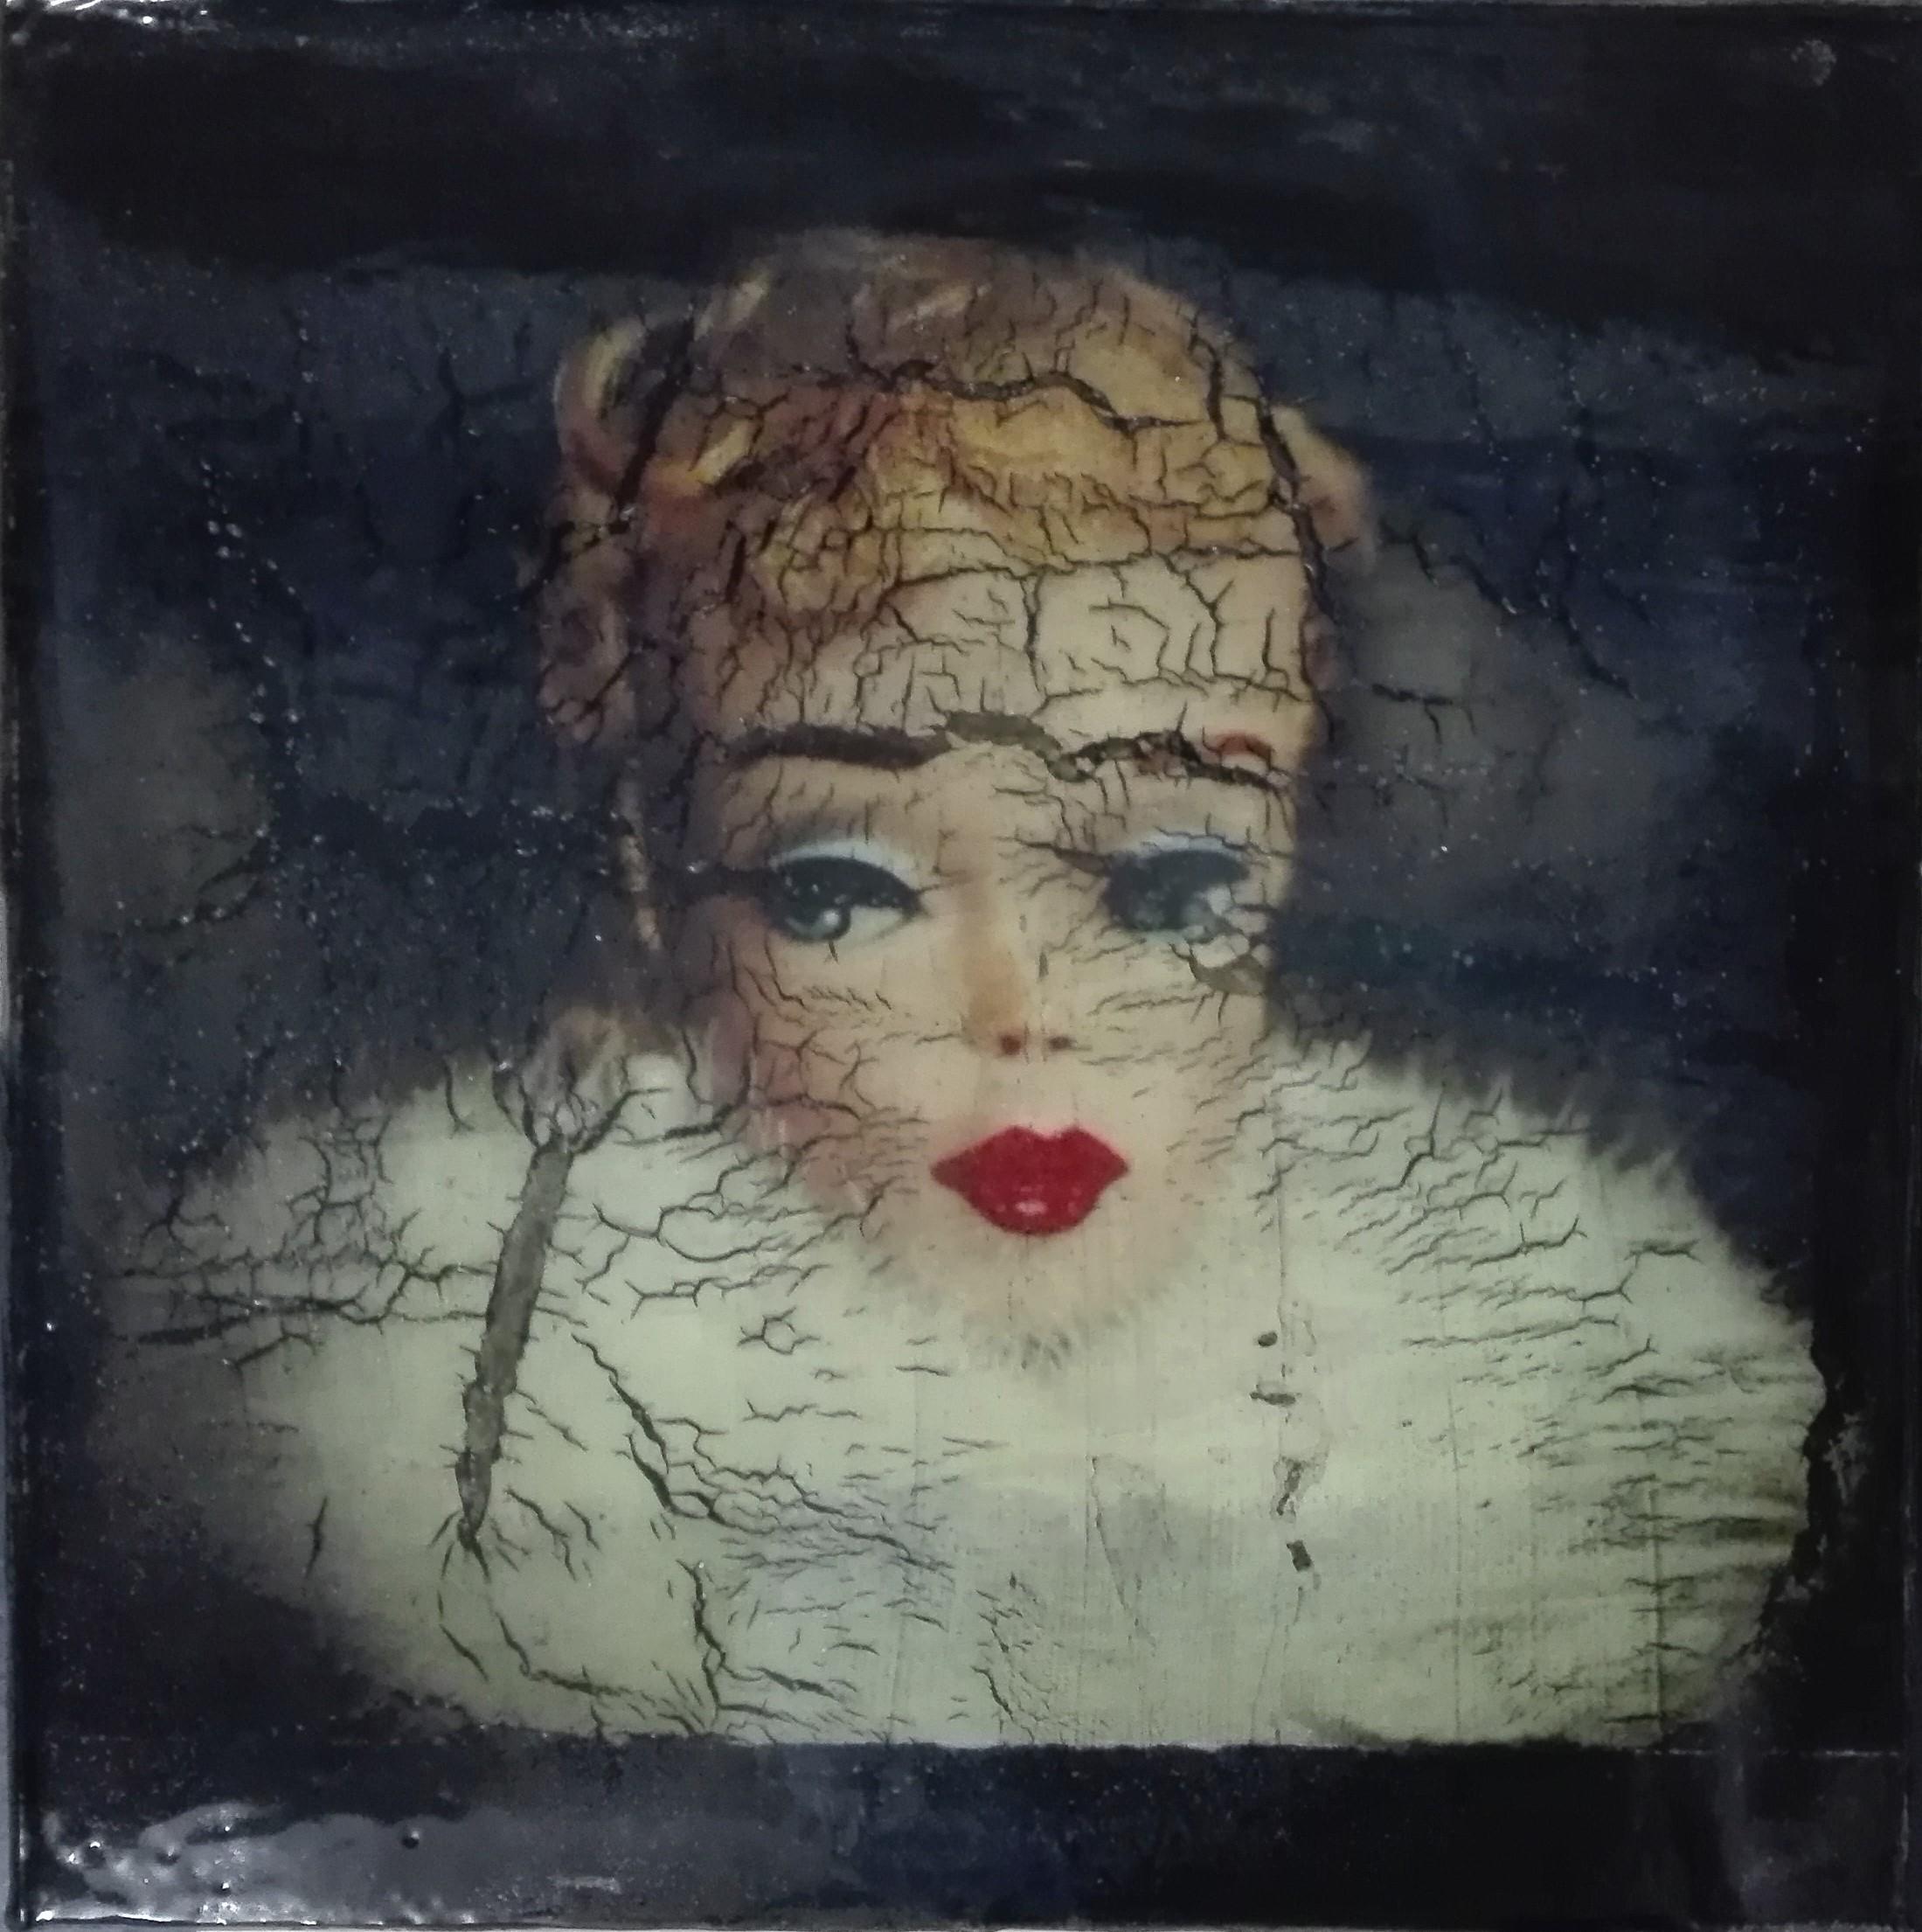 """beauty more than bitterness, makes the heart break"" - acryl, papier, kunstharz auf leinwand - 20 x 20 x 8 cm"